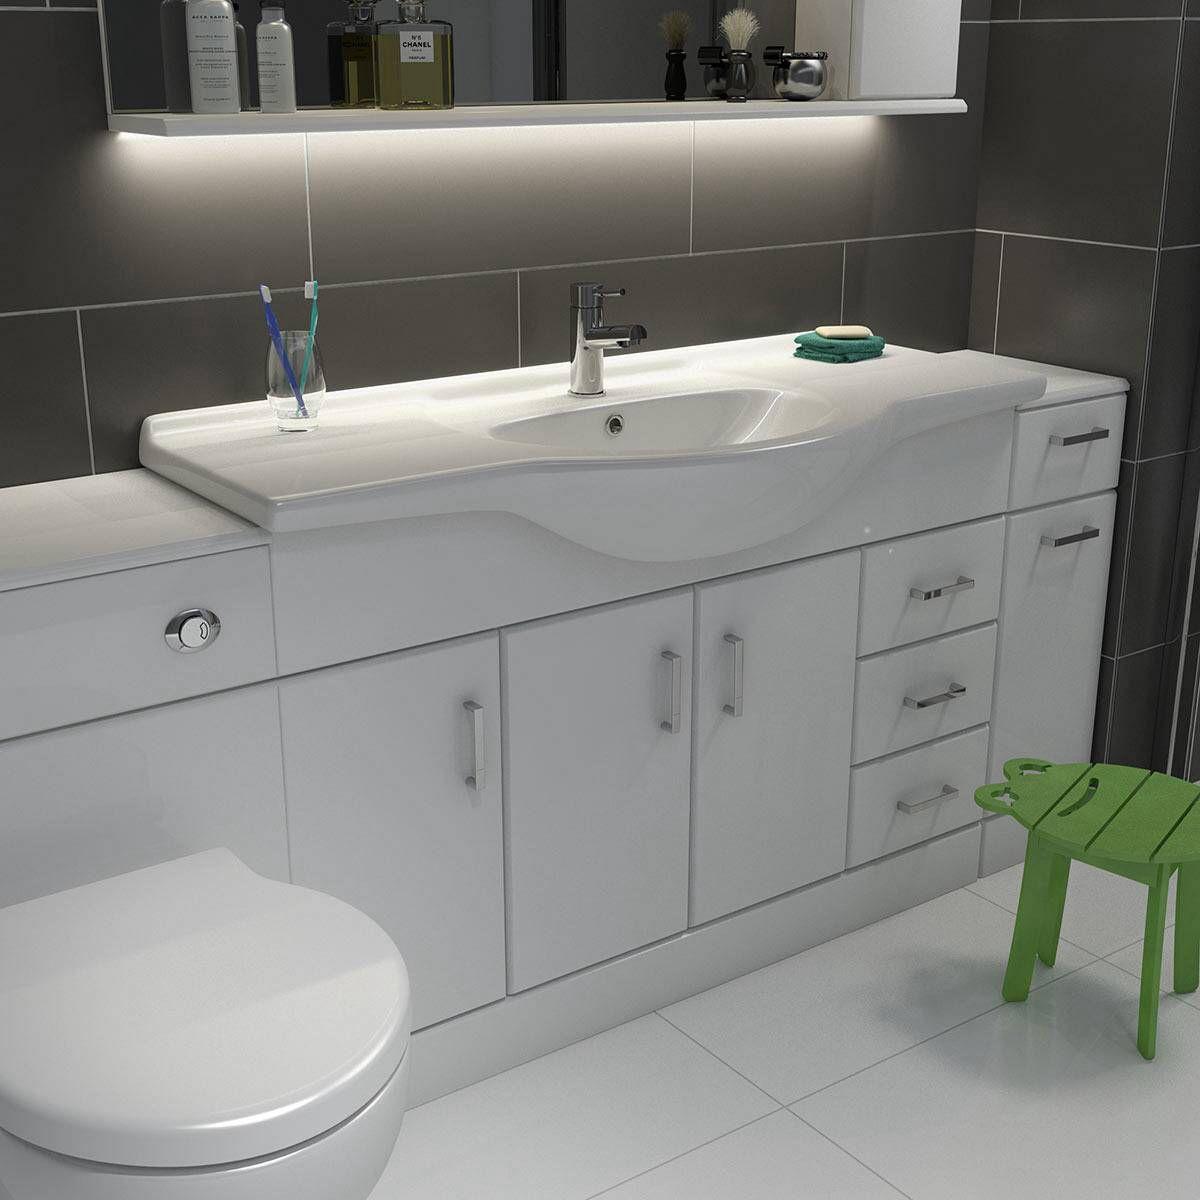 Victoria Plumb Bathroom Design Bathroom Makeover Monochrome Bathroom